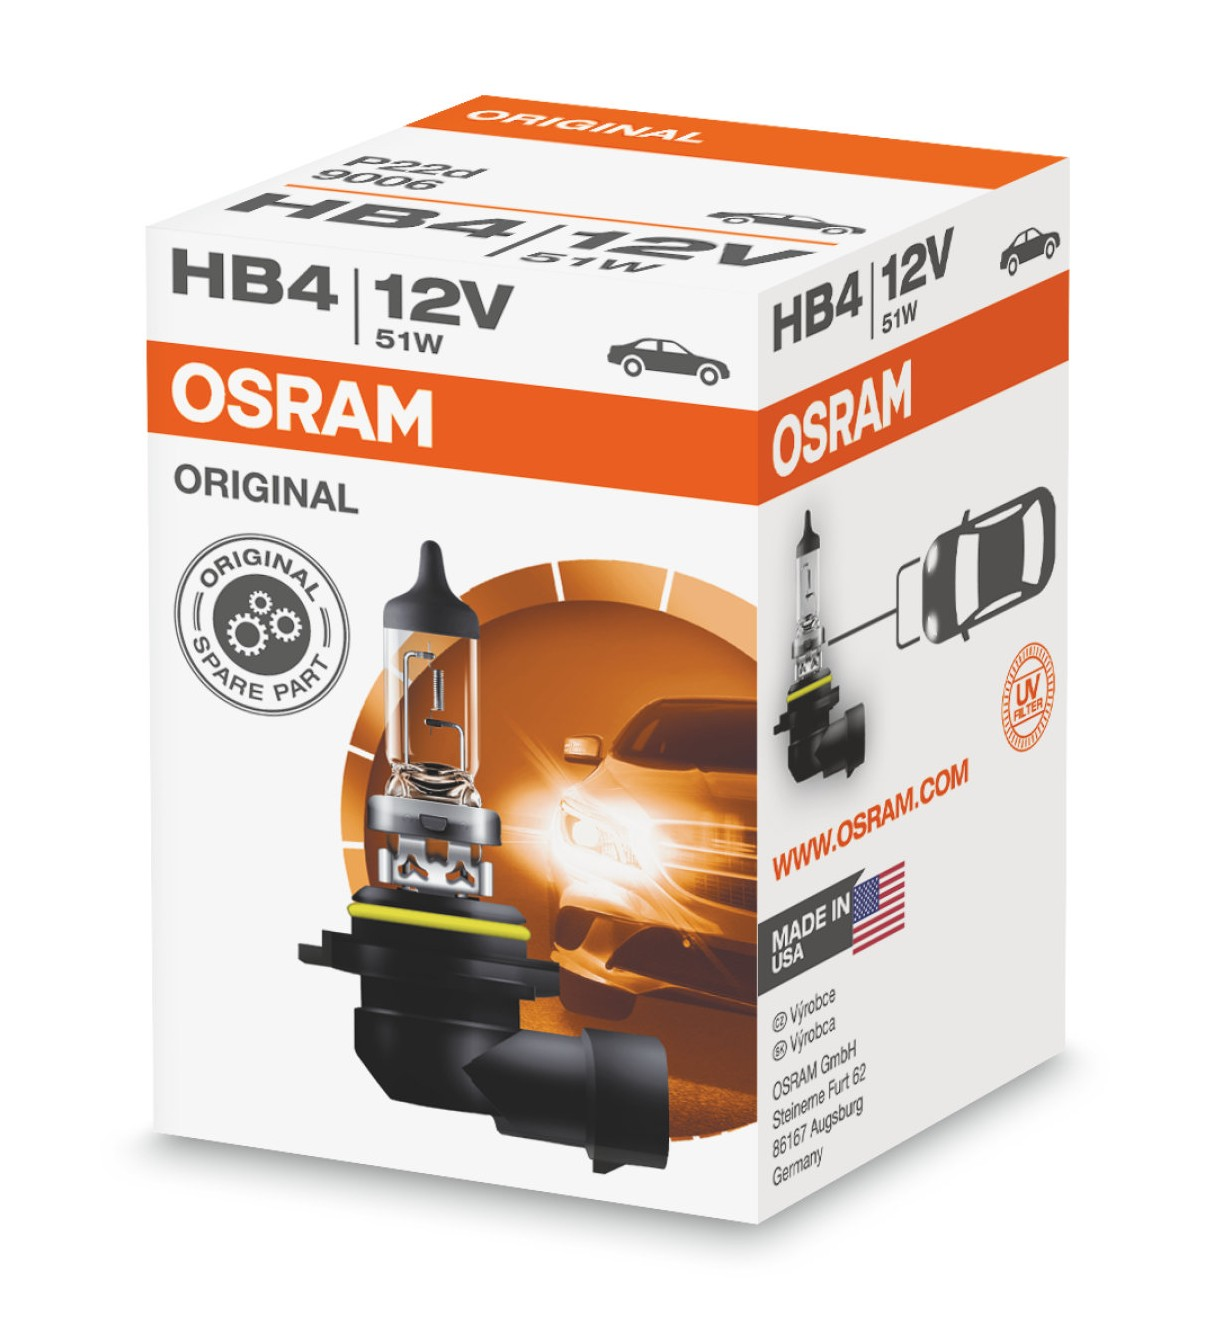 Halogenlampa HB4 51W